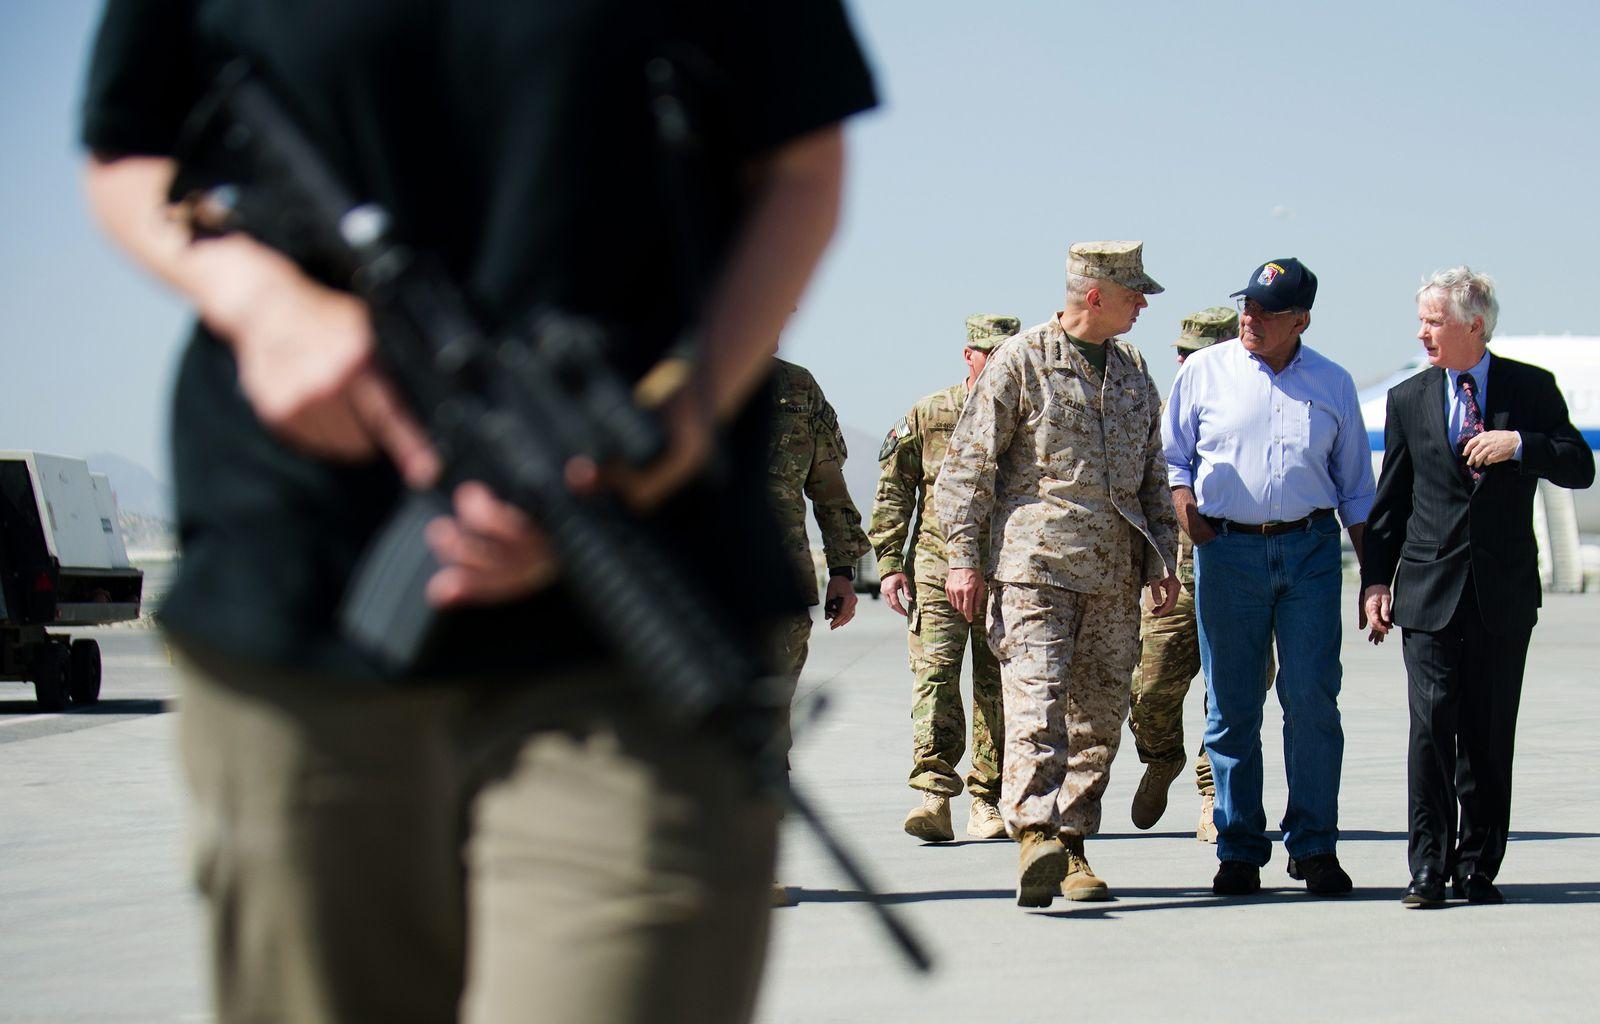 panetta in afghanistan rollfeld